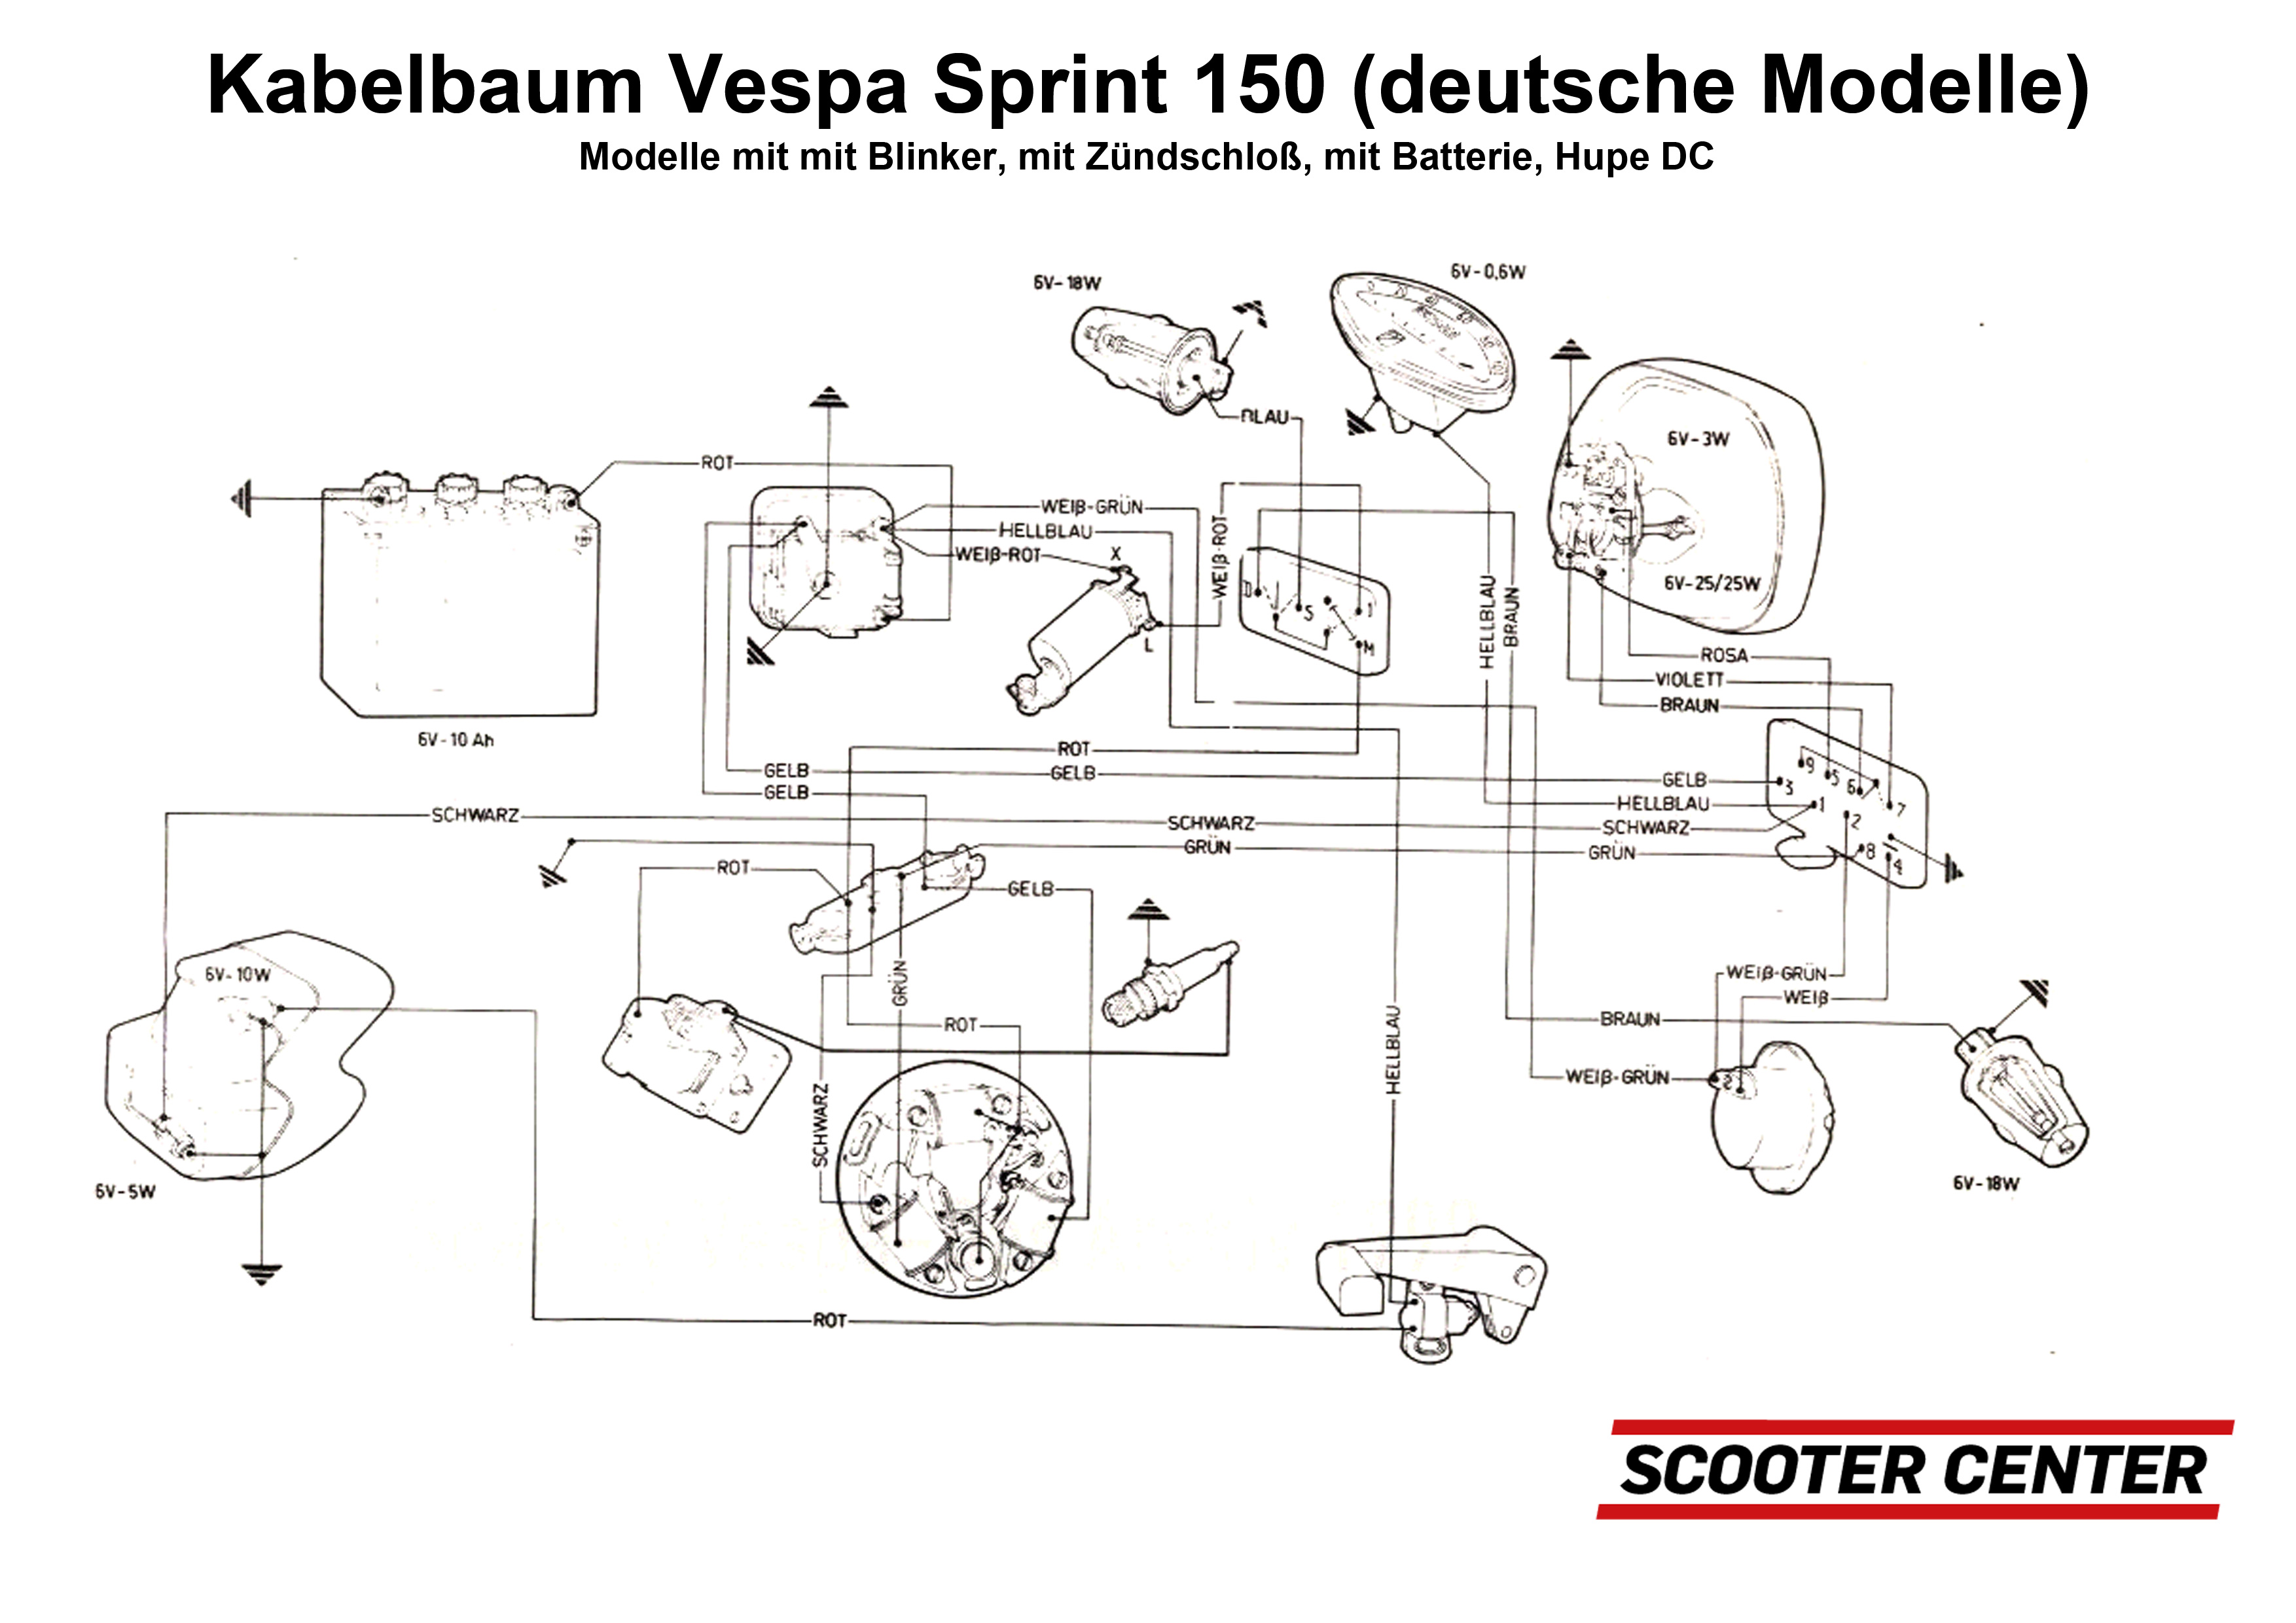 Lambretta Bgm Wiring Diagram Best And Letter Vespatronic Plete Loom Pro Vespa Sprint150 German Versions